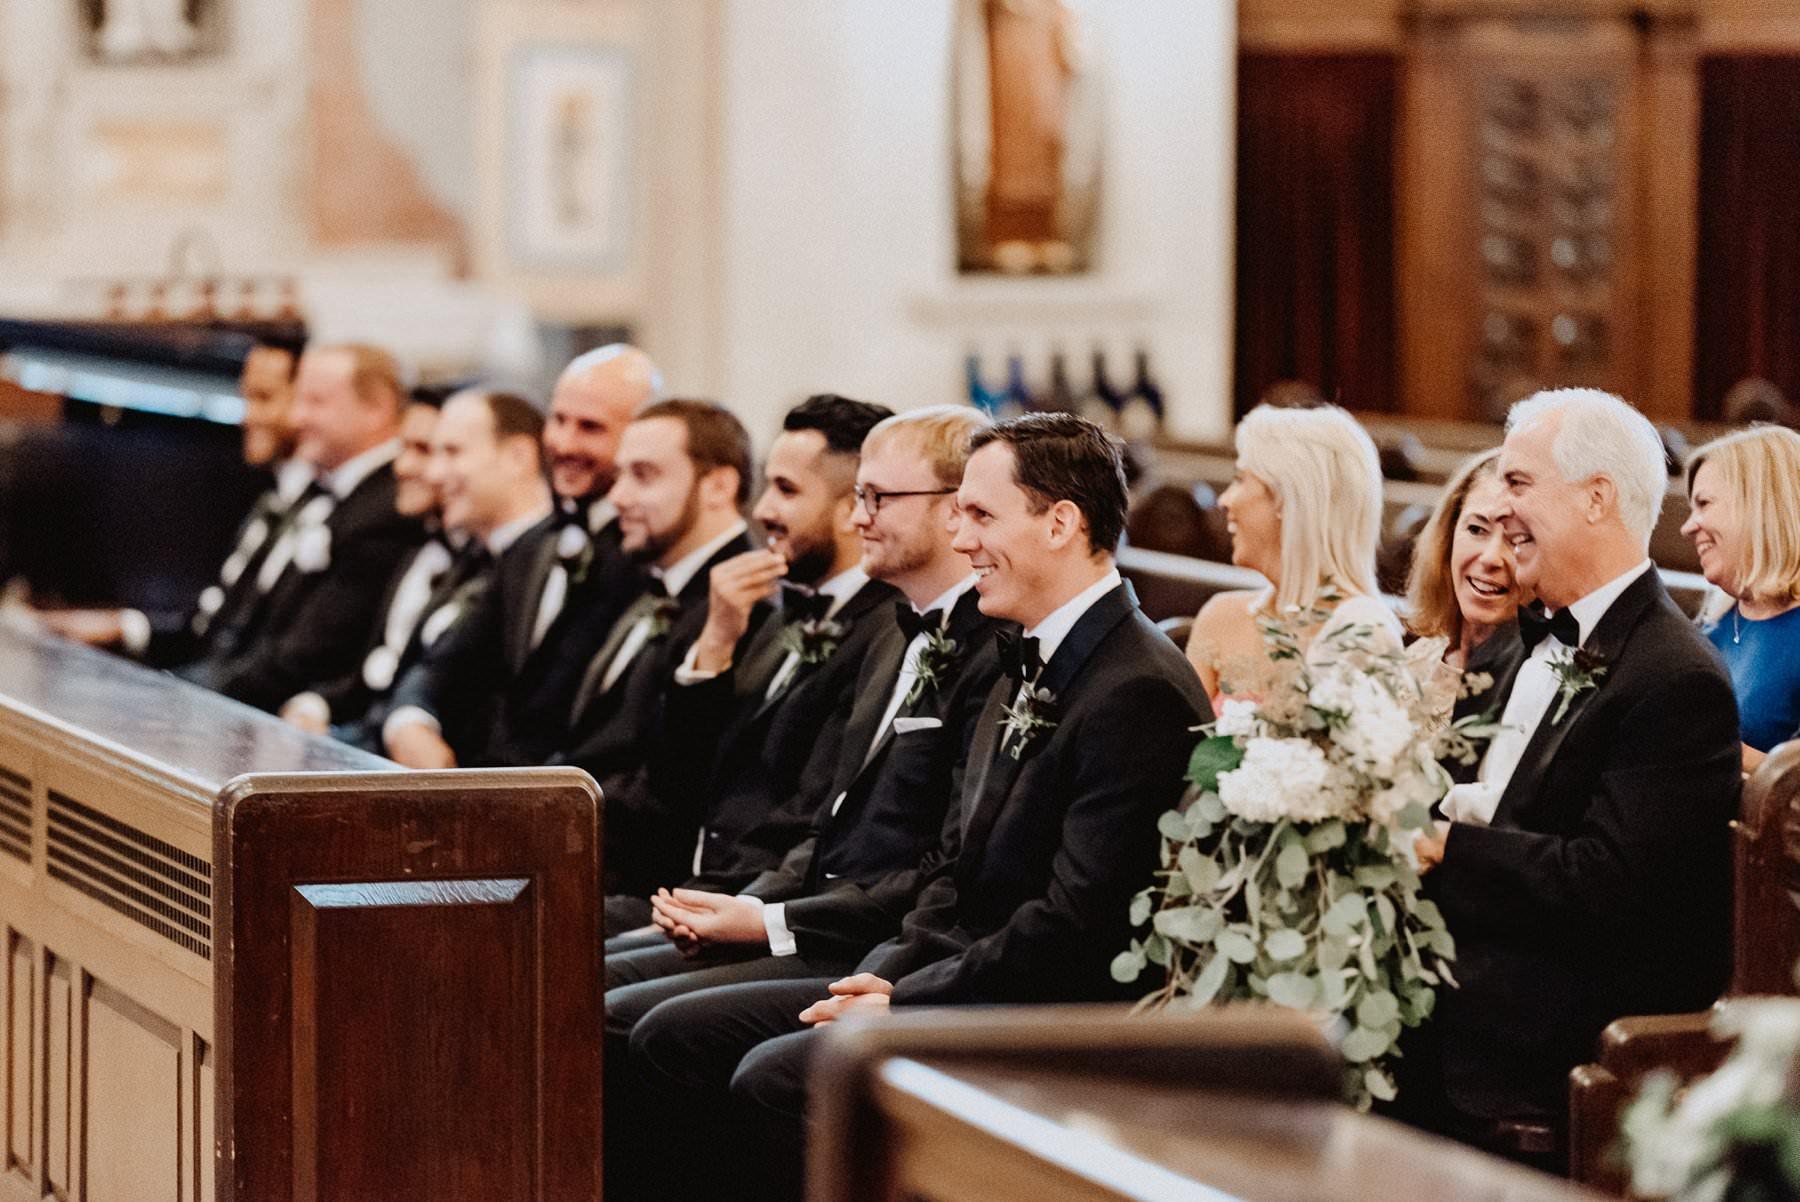 Philadelphia_private_estate_wedding-035.jpg